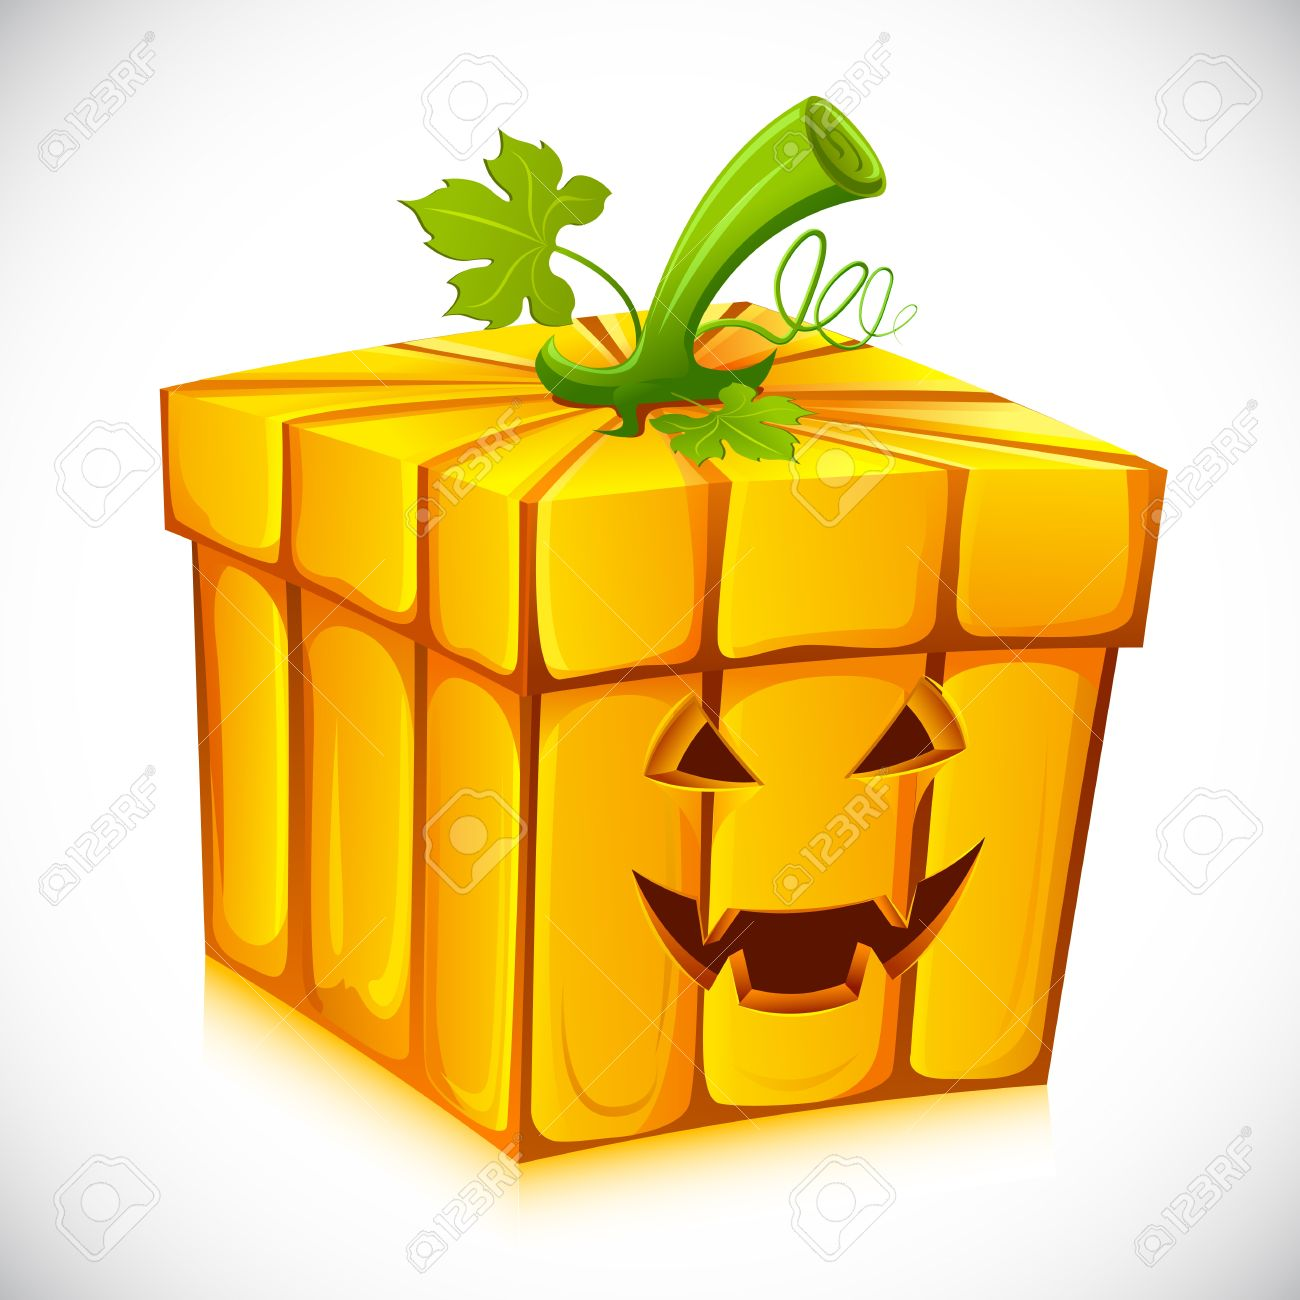 Illustration Of Pumpkin Shape Gift Box For Halloween Stock Photo.